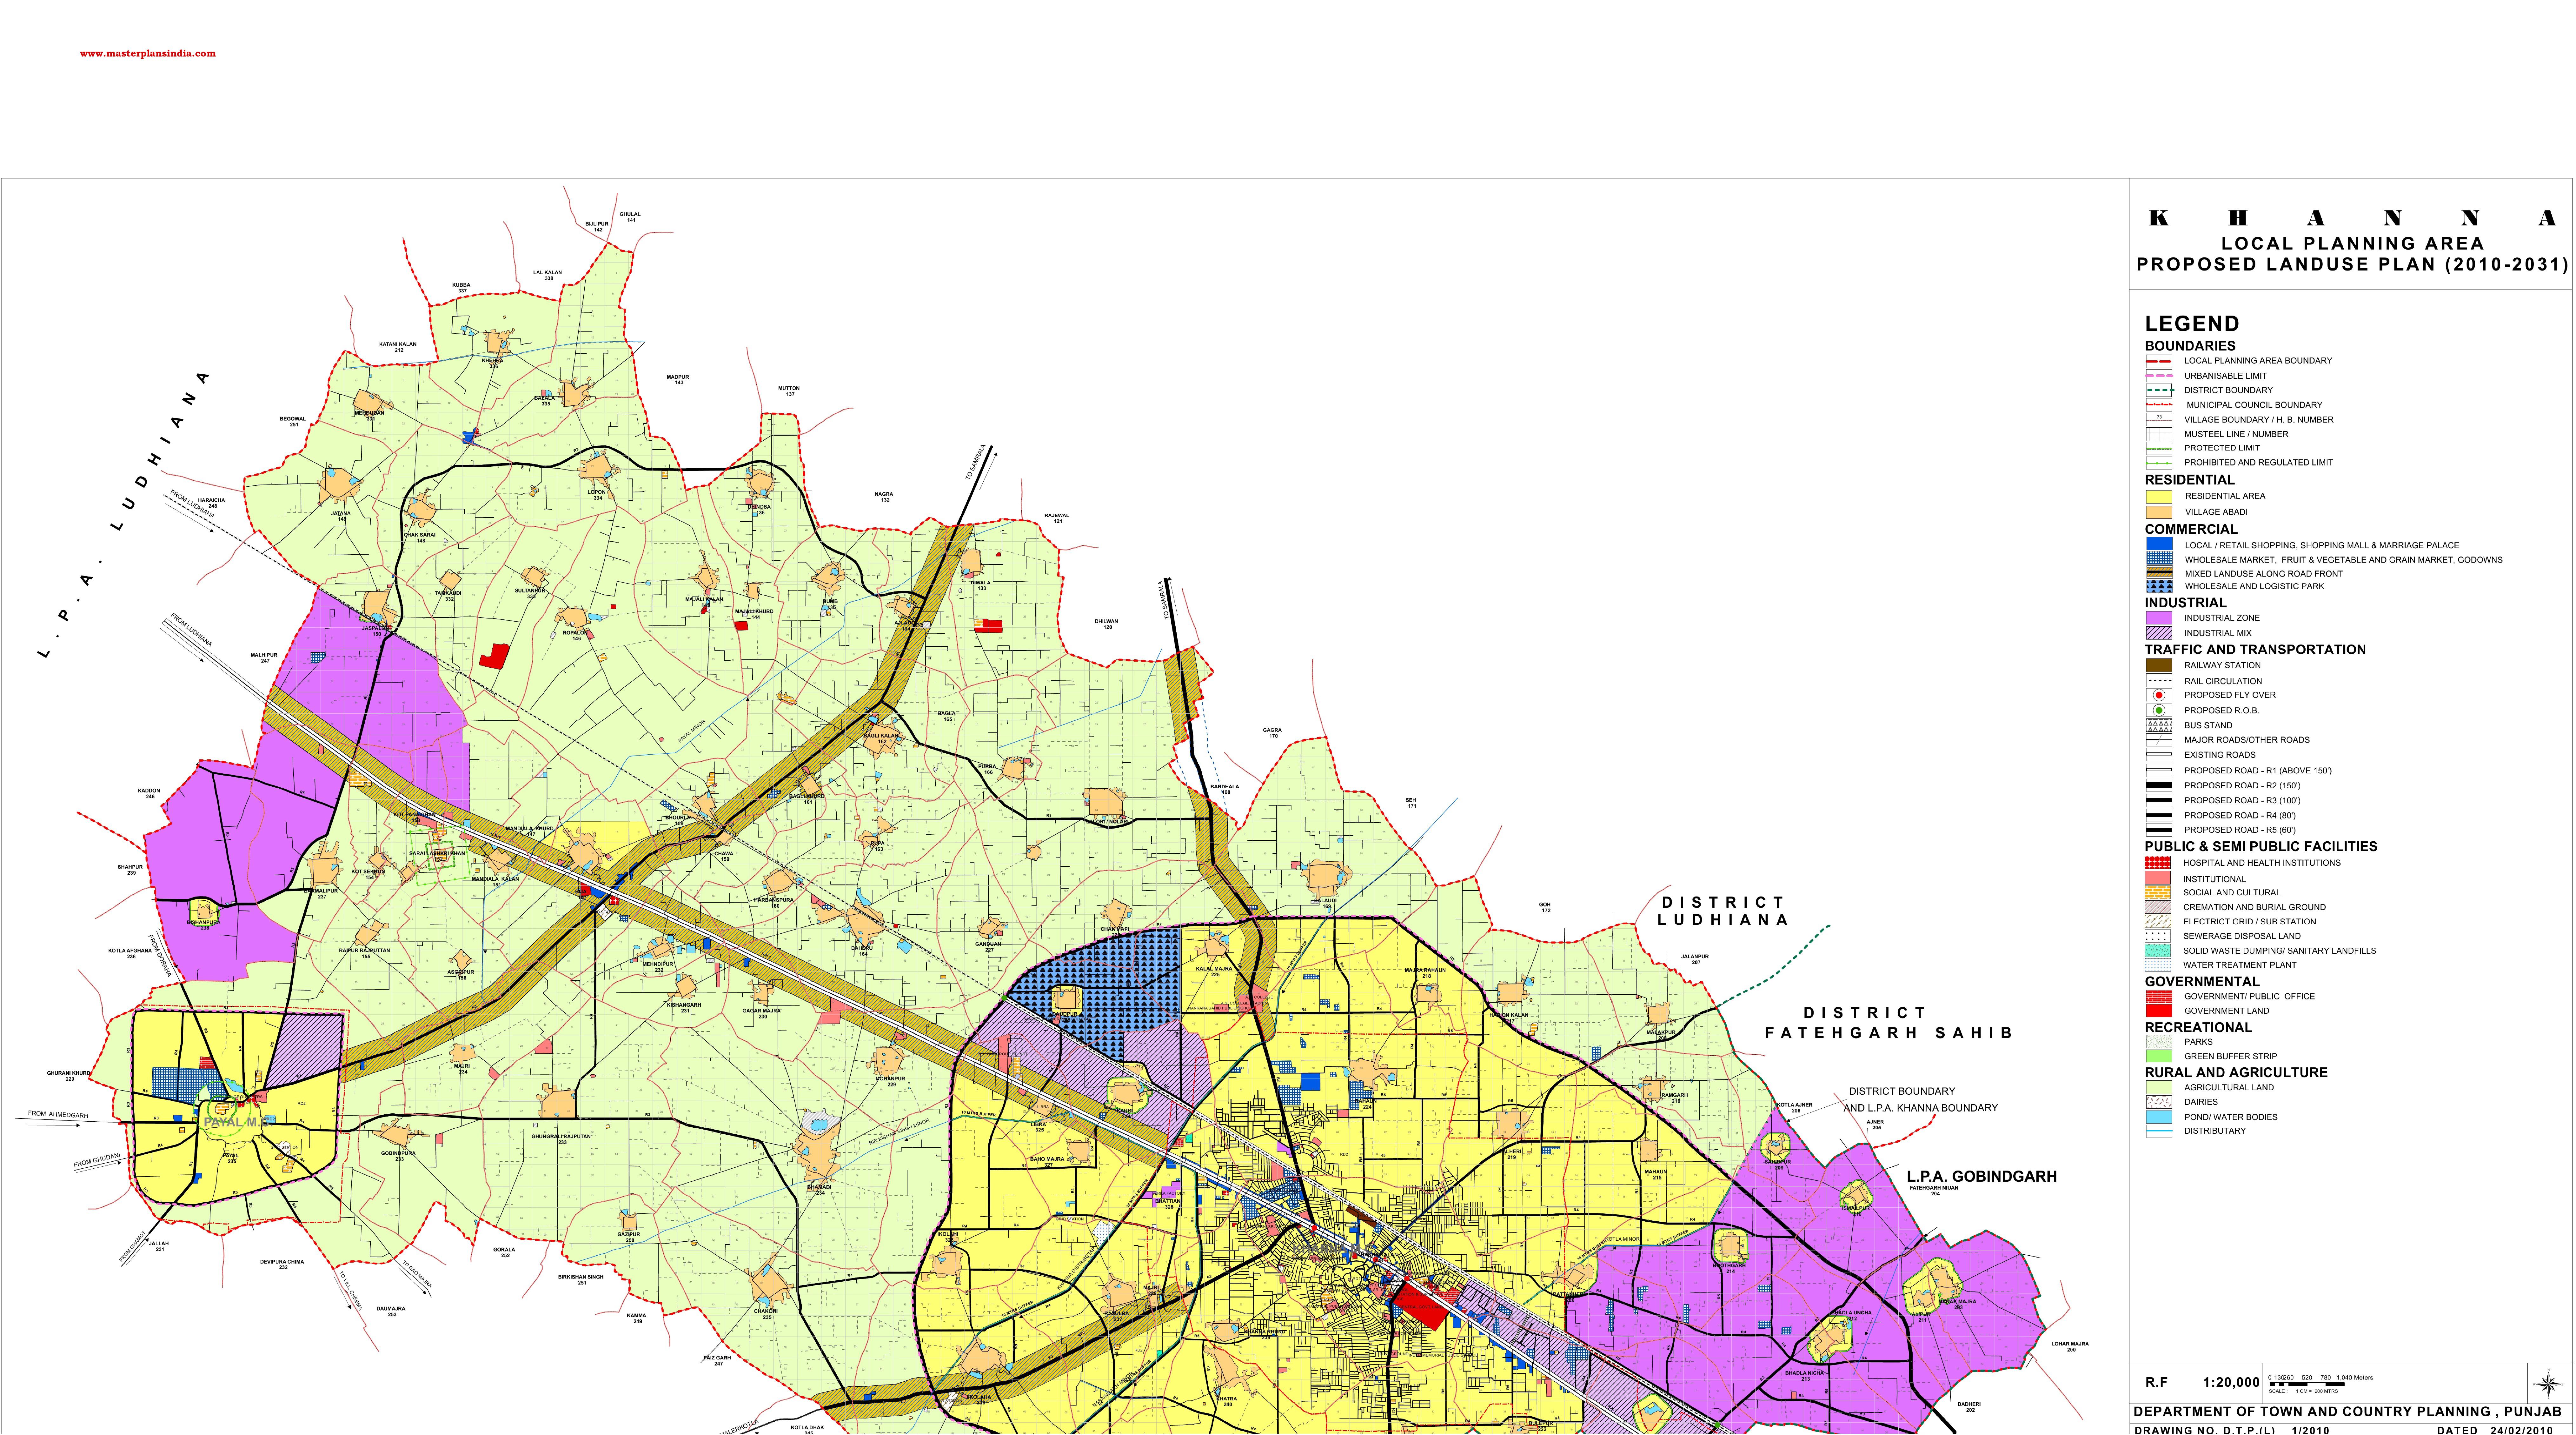 Khanna Master Plan 2031 Map PDF Download - Master Plans India